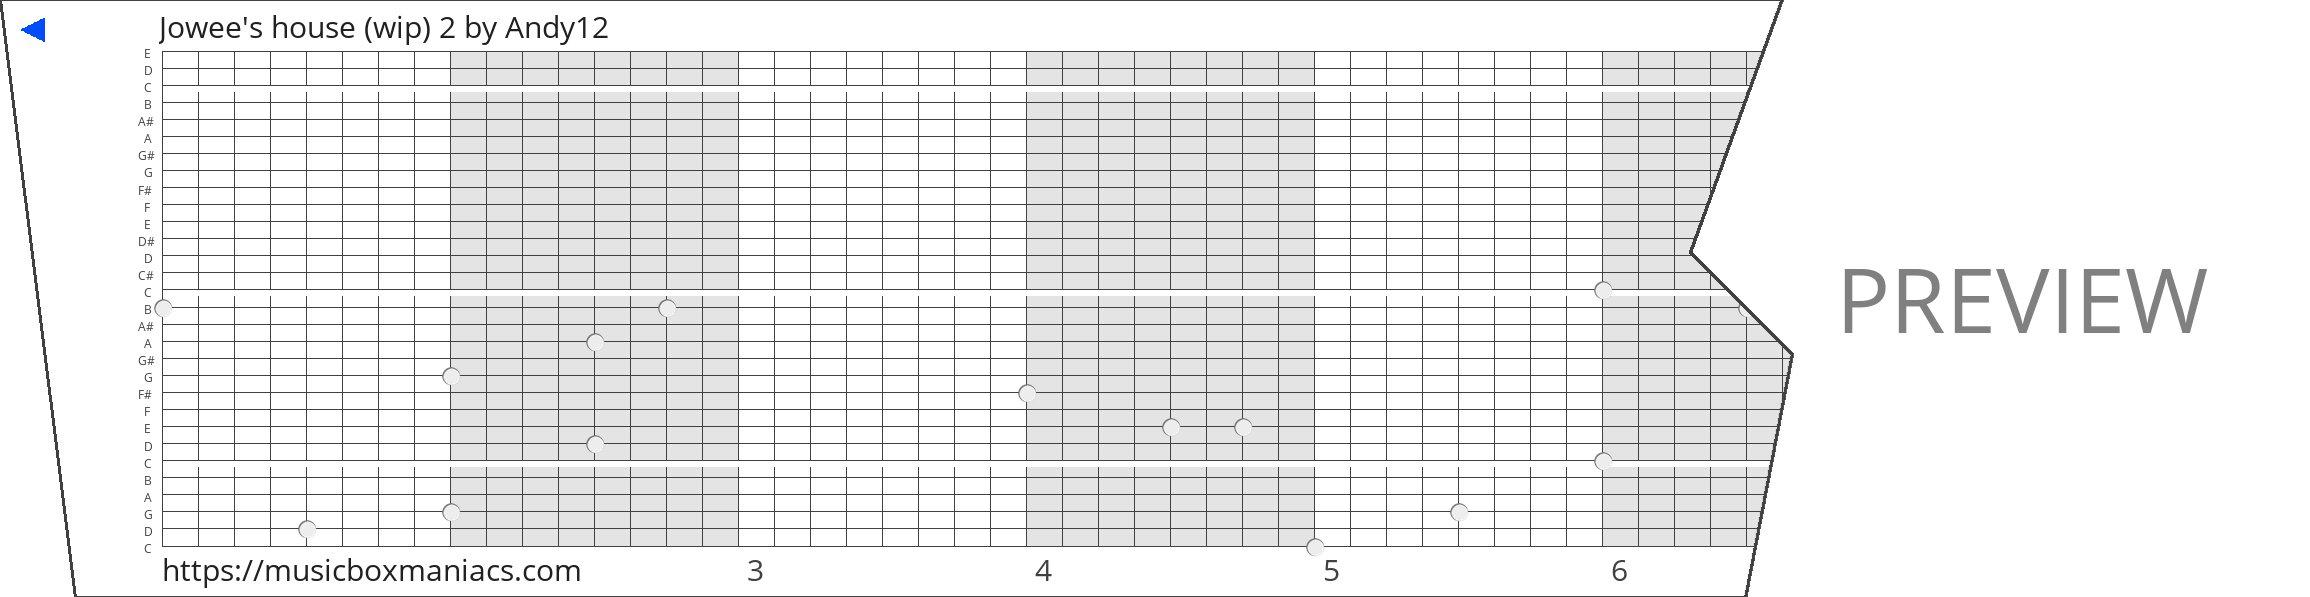 Jowee's house (wip) 2 30 note music box paper strip